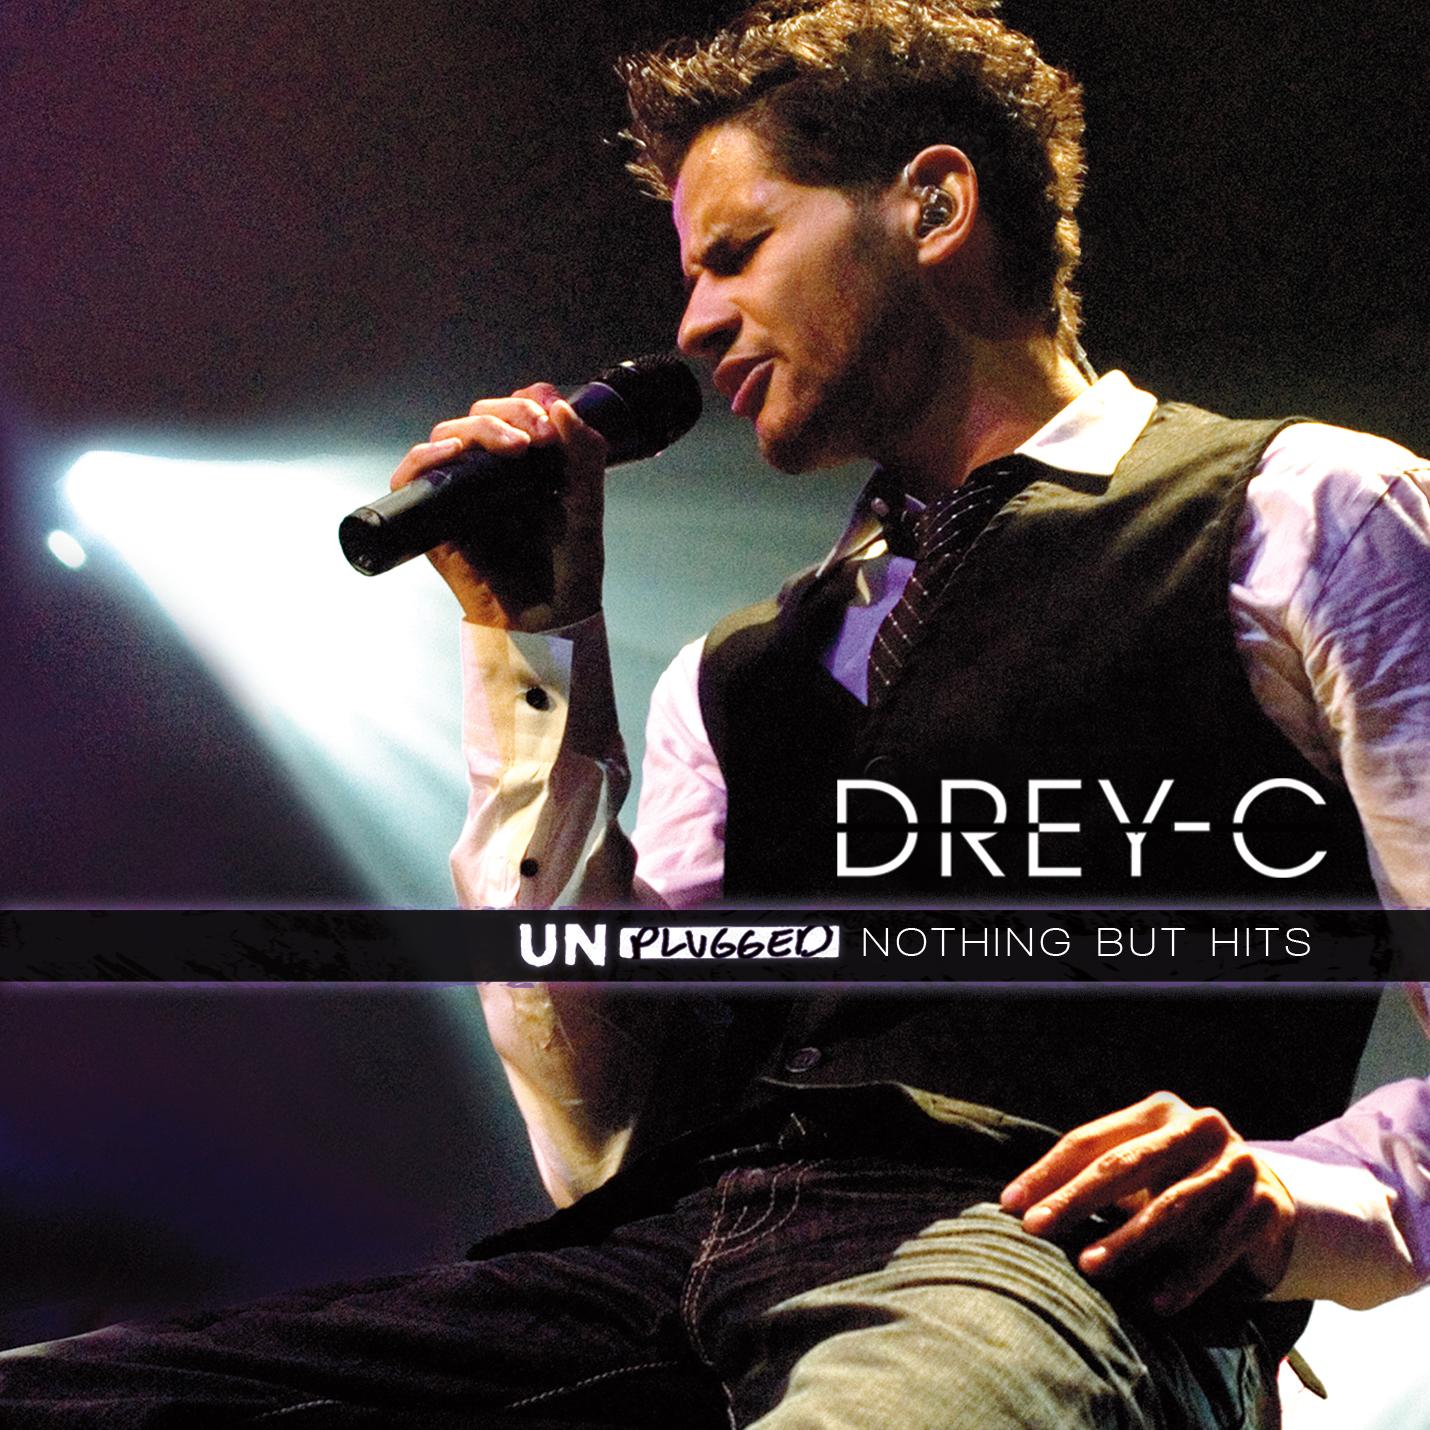 Drey-C Unplugged